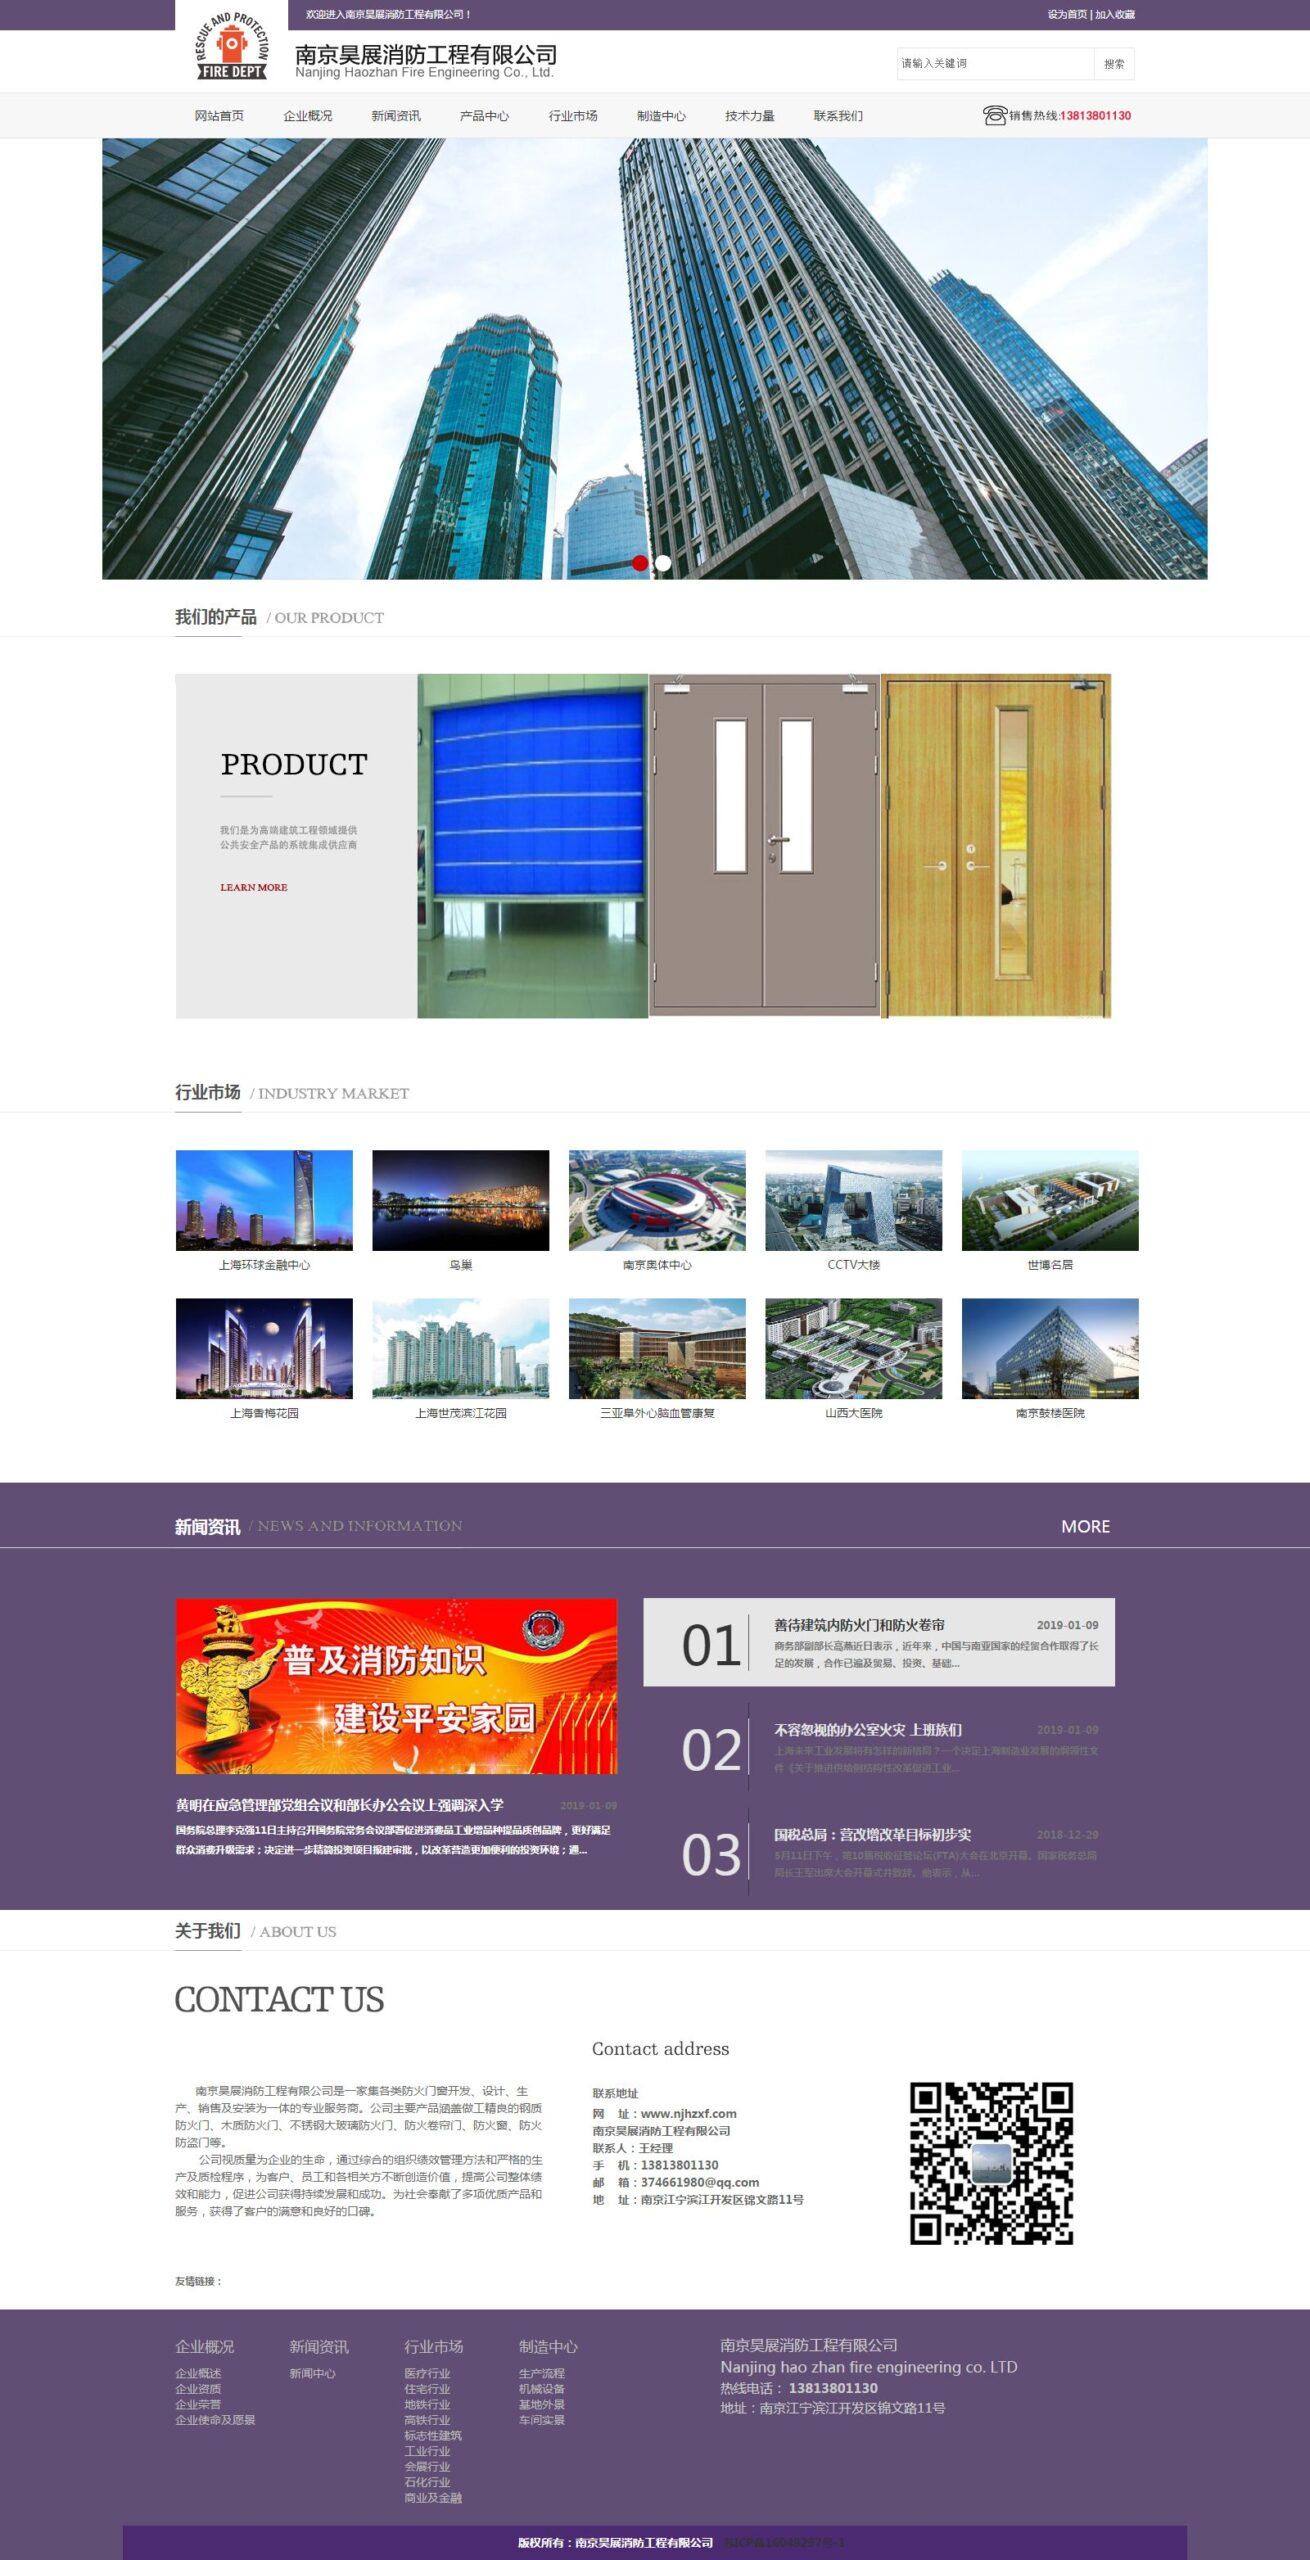 D114织梦dedecms消防工程公司网站模板免费下载[自适应手机版]